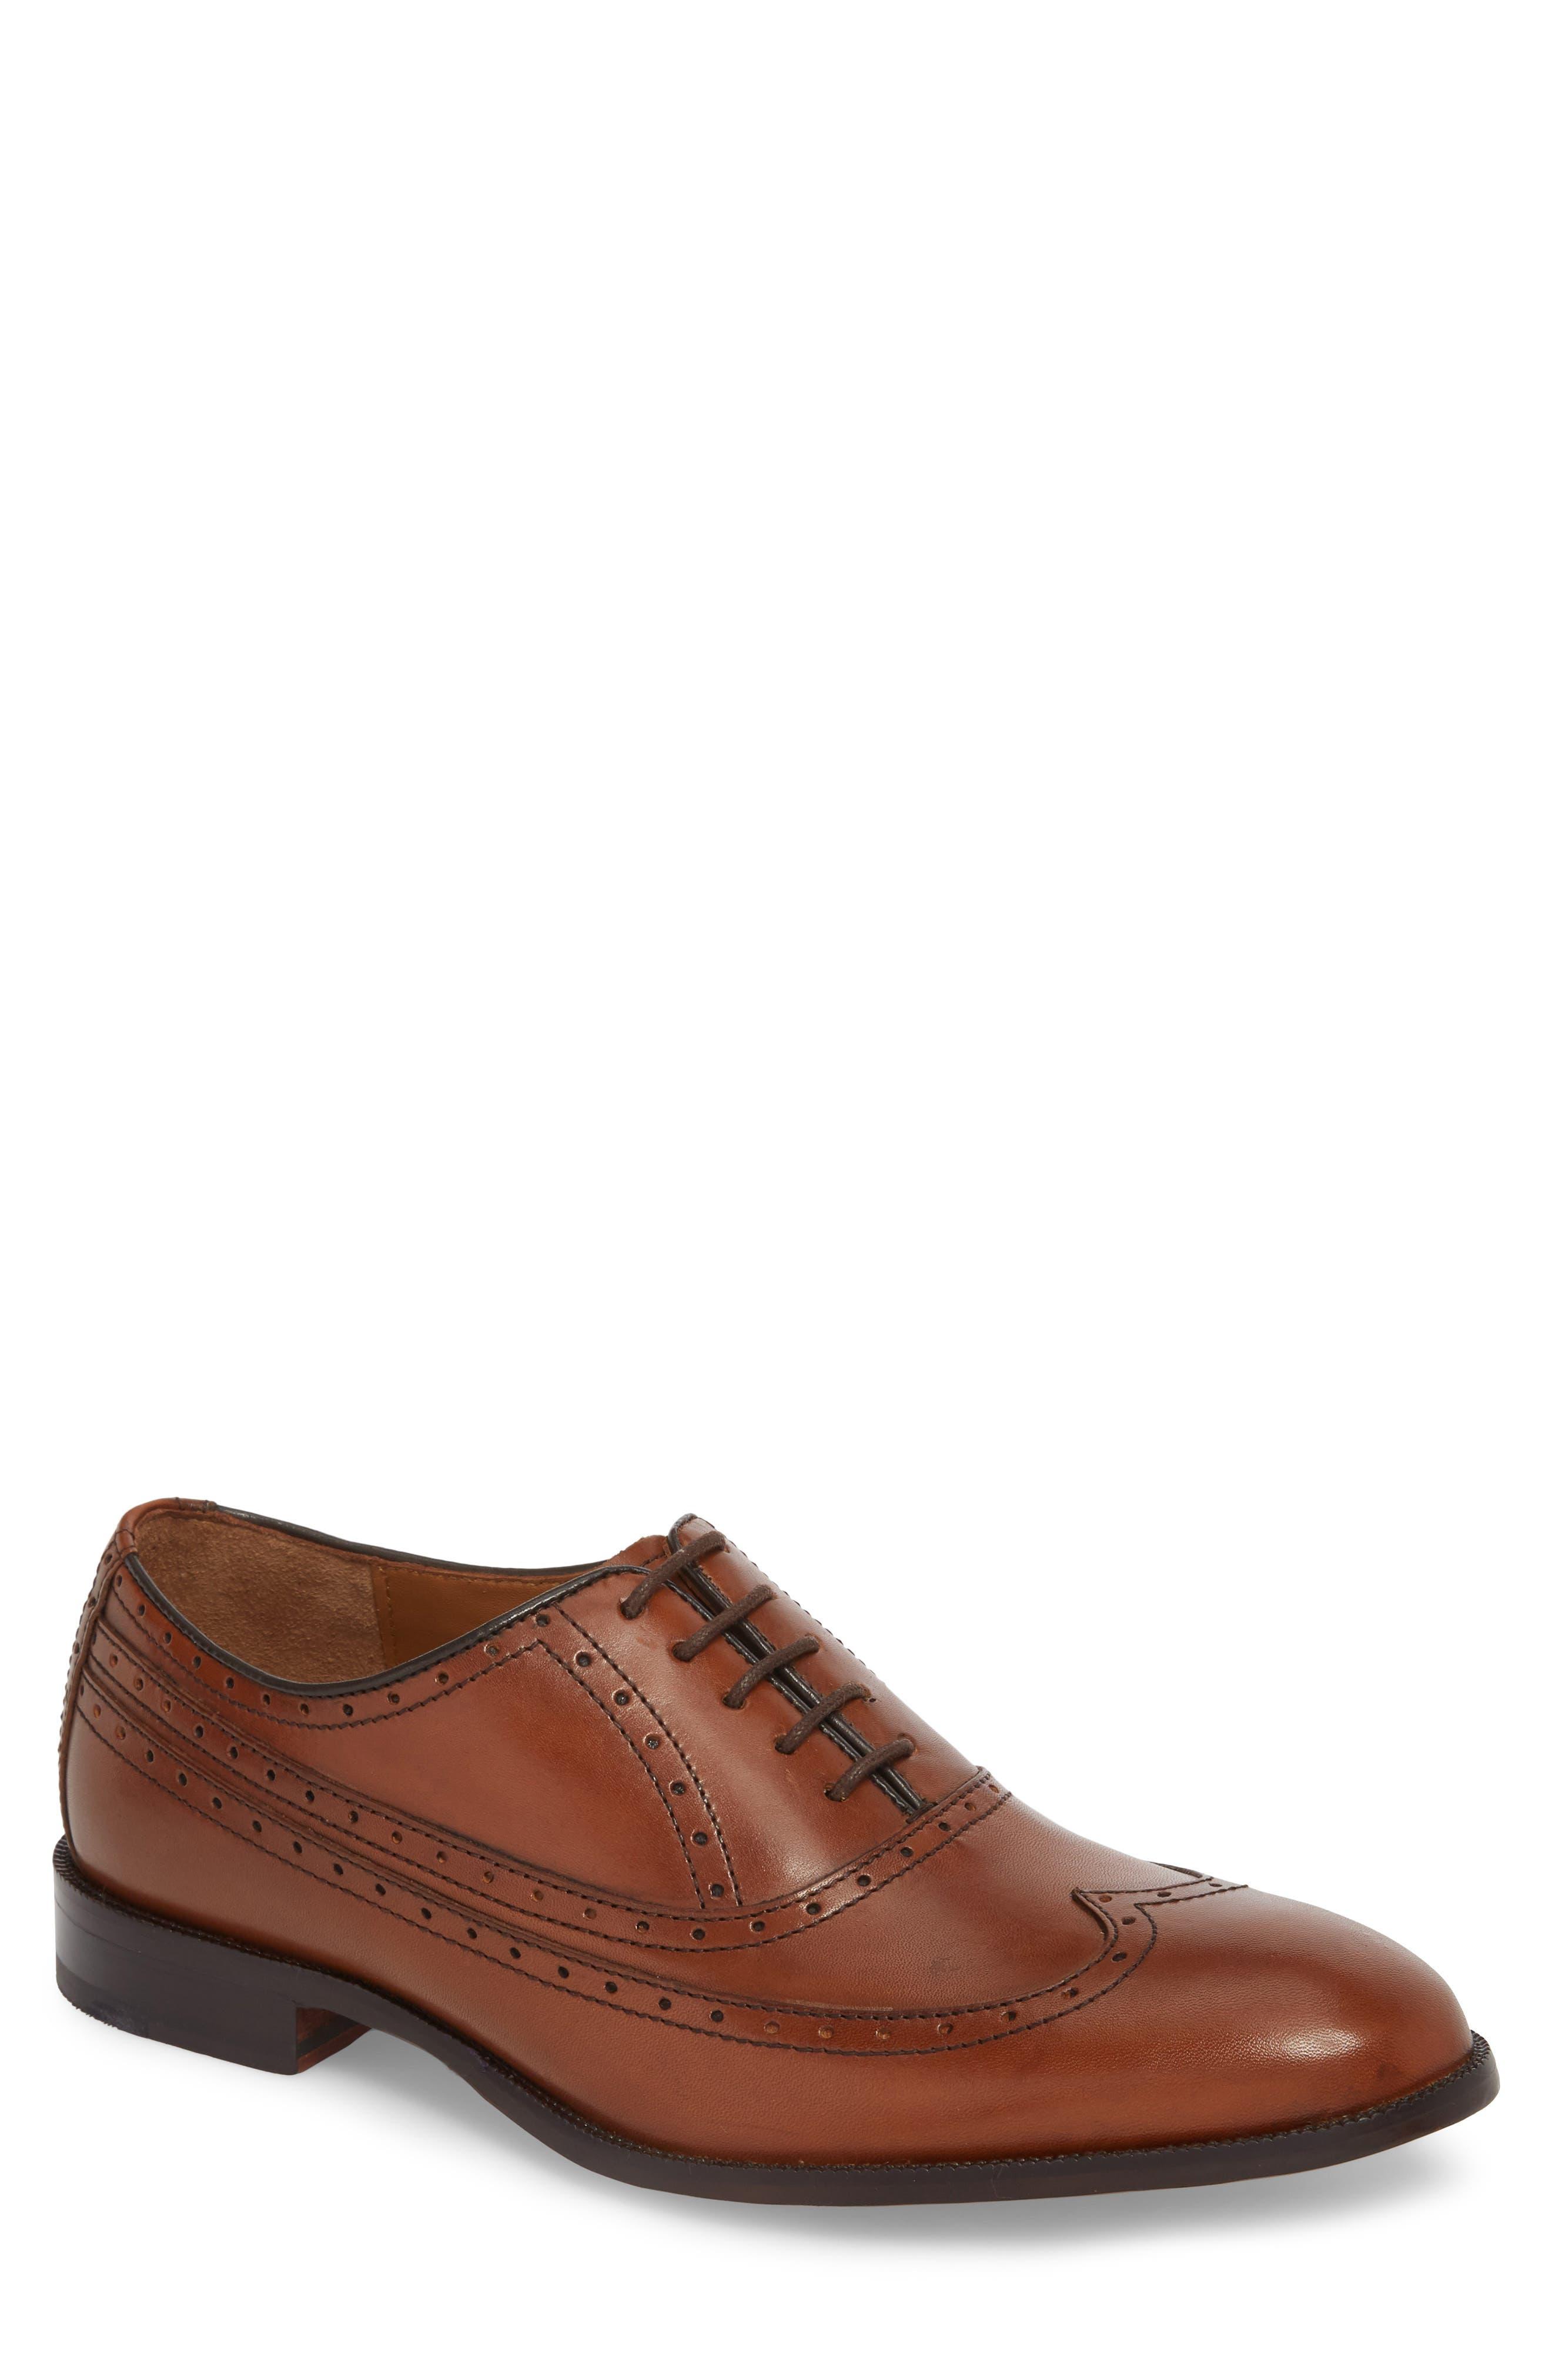 Bradford Wingtip Oxford,                             Main thumbnail 1, color,                             Tan Leather